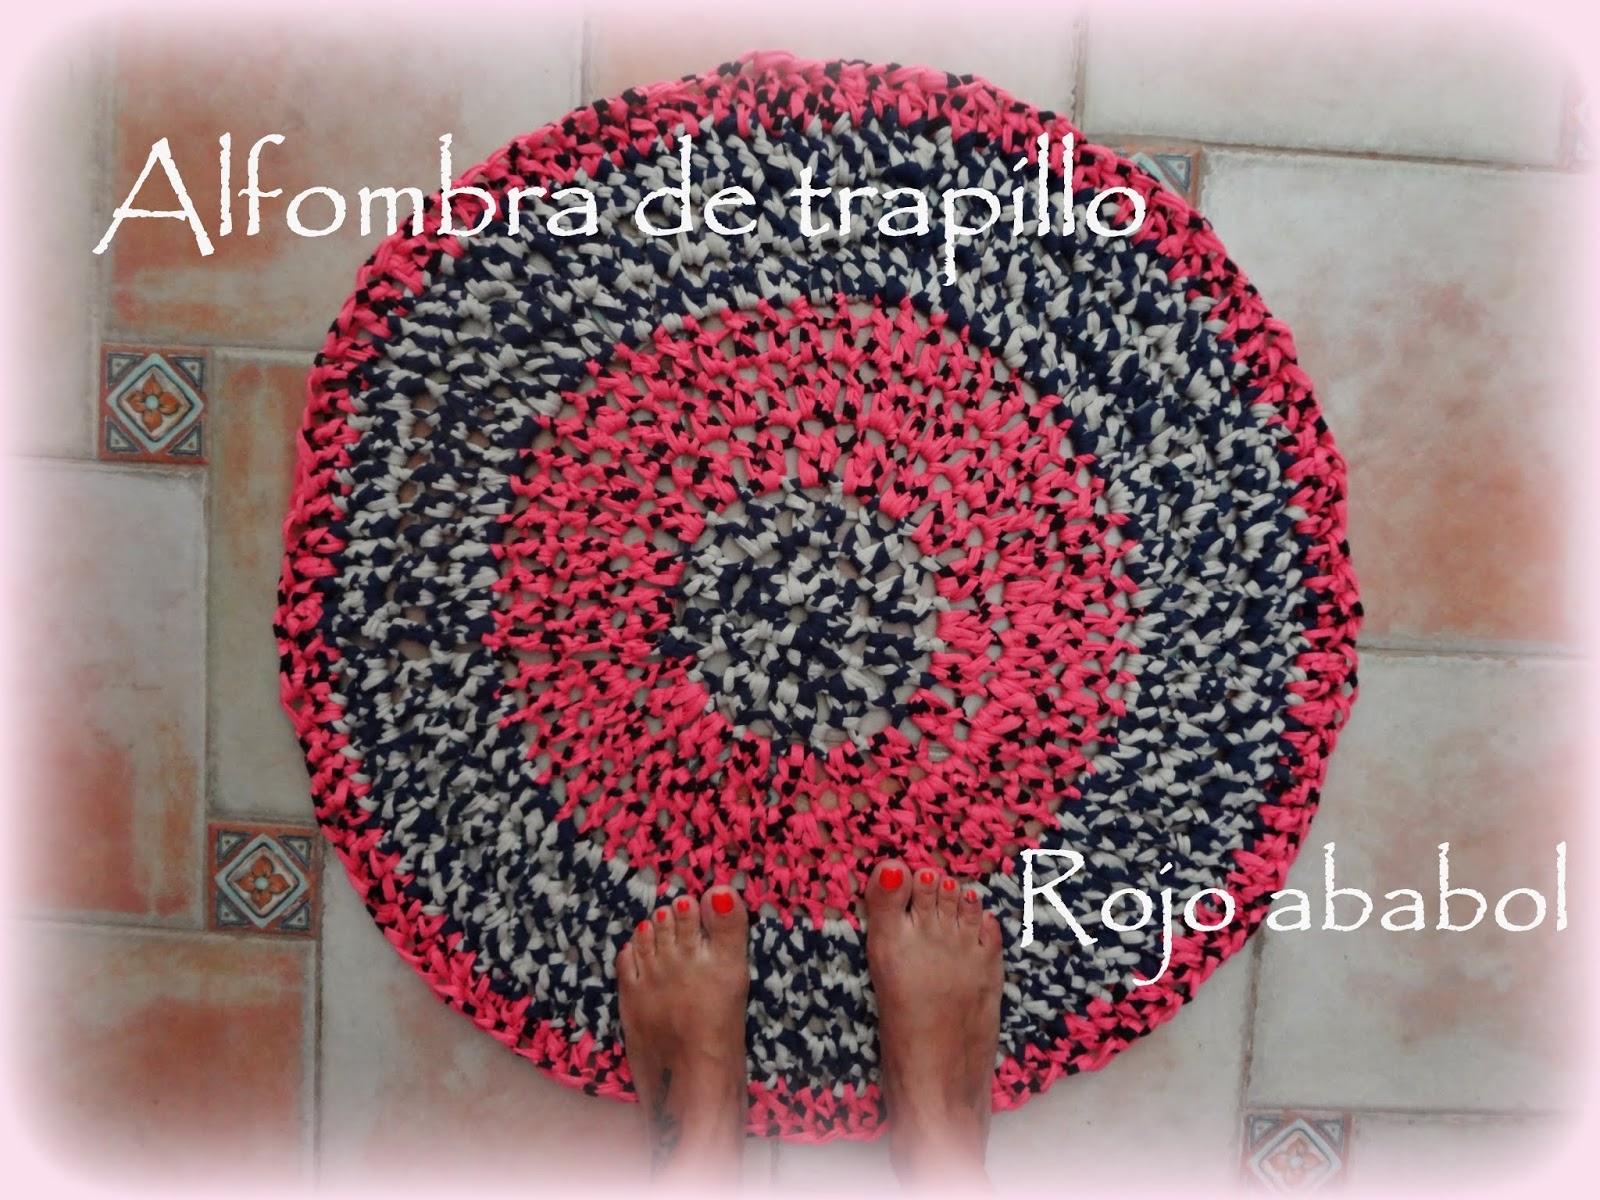 Rojo Ababol Alfombra De Trapillo | Caroldoey